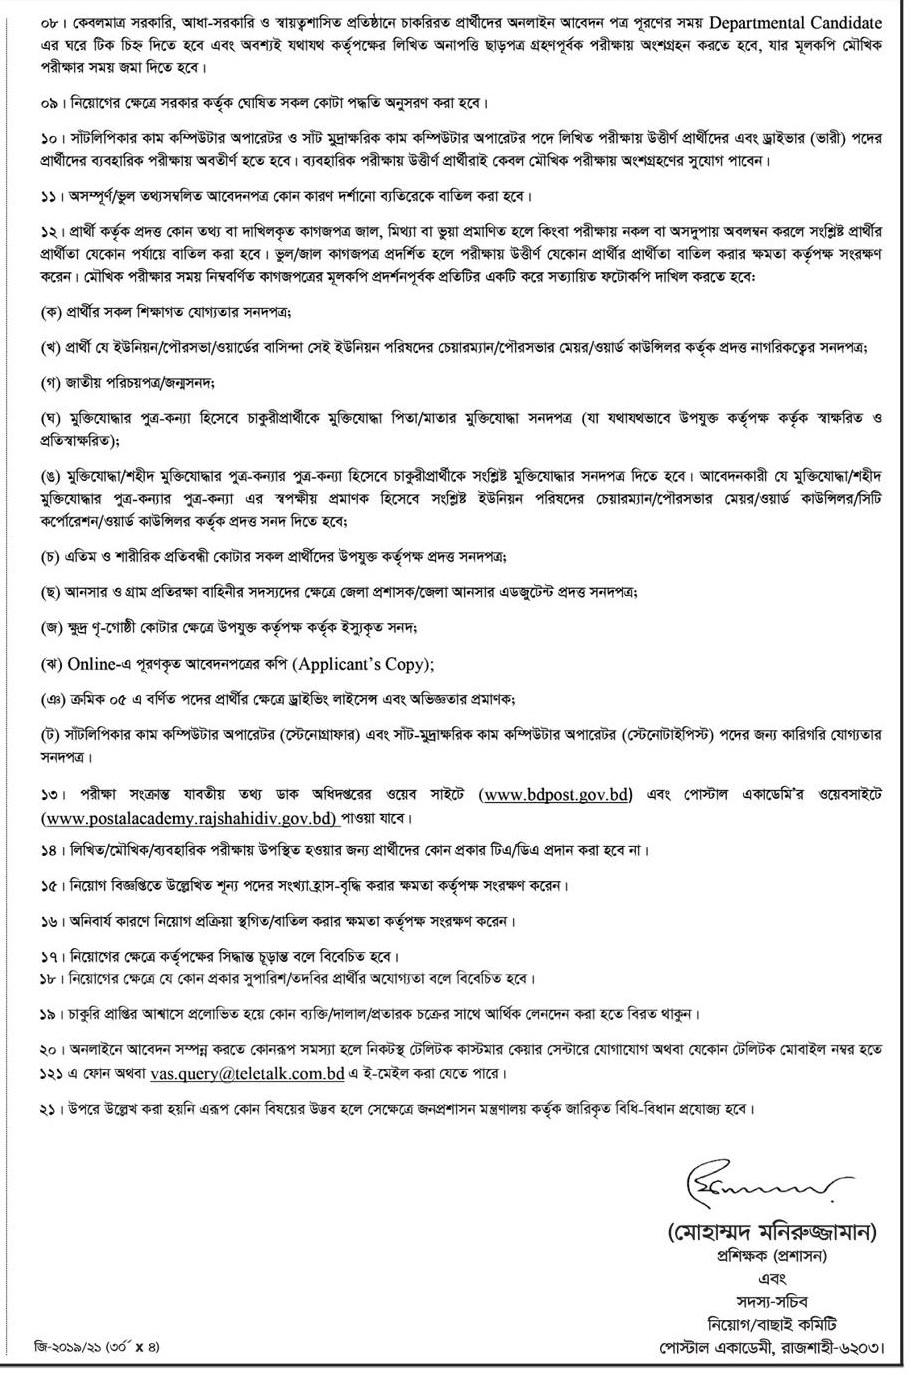 https://bdjobs24.net/wp-content/uploads/2021/10/bdpost-postal-Academy-Rajshahi-Job-Circular-2021-scaled.jpg